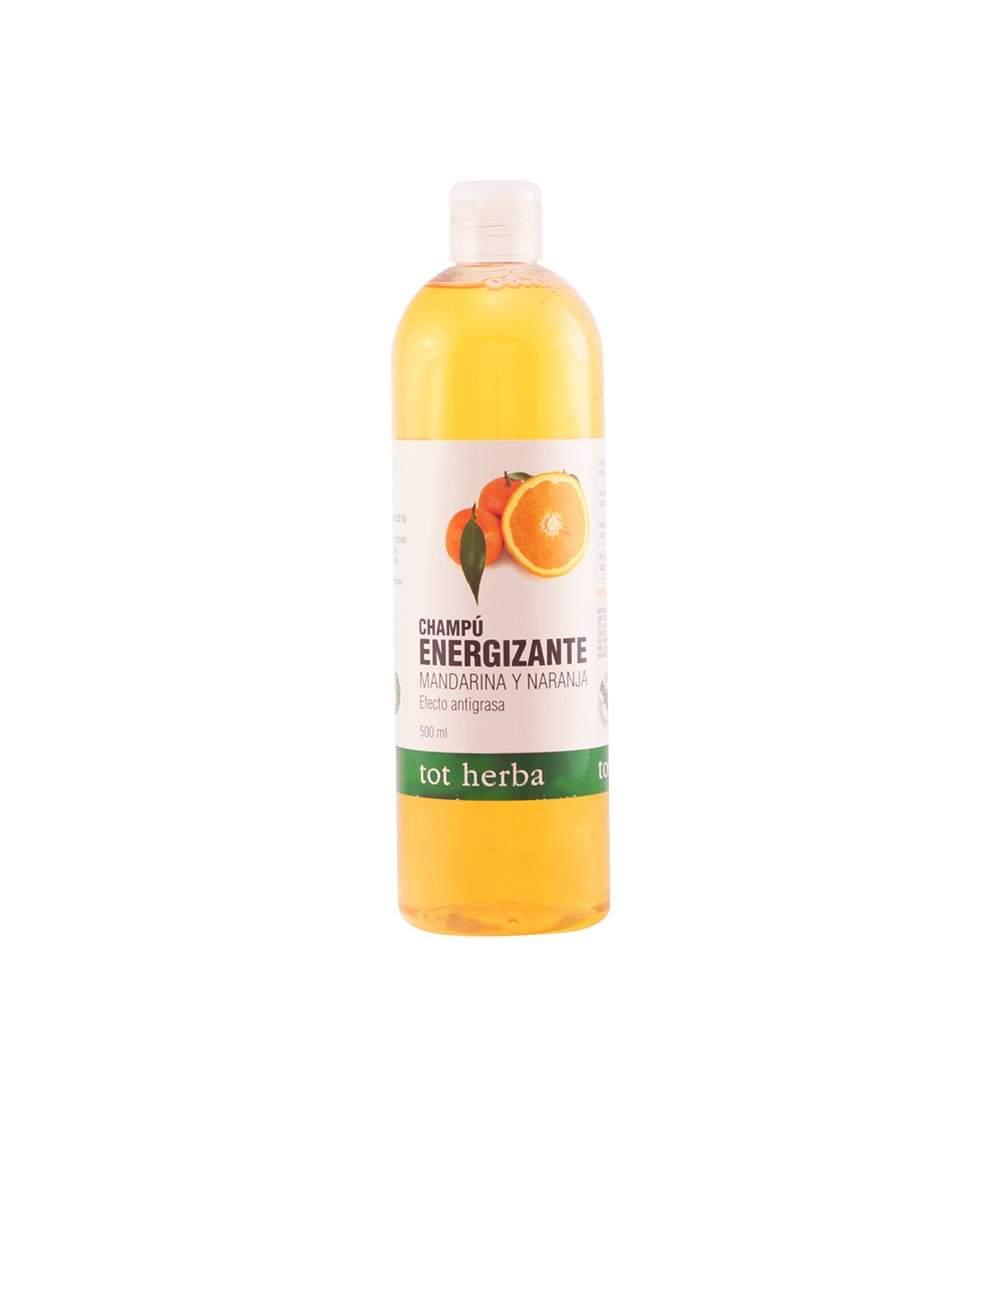 Champú Energizante Natural de Naranja y Mandarina. Tot Herbá.